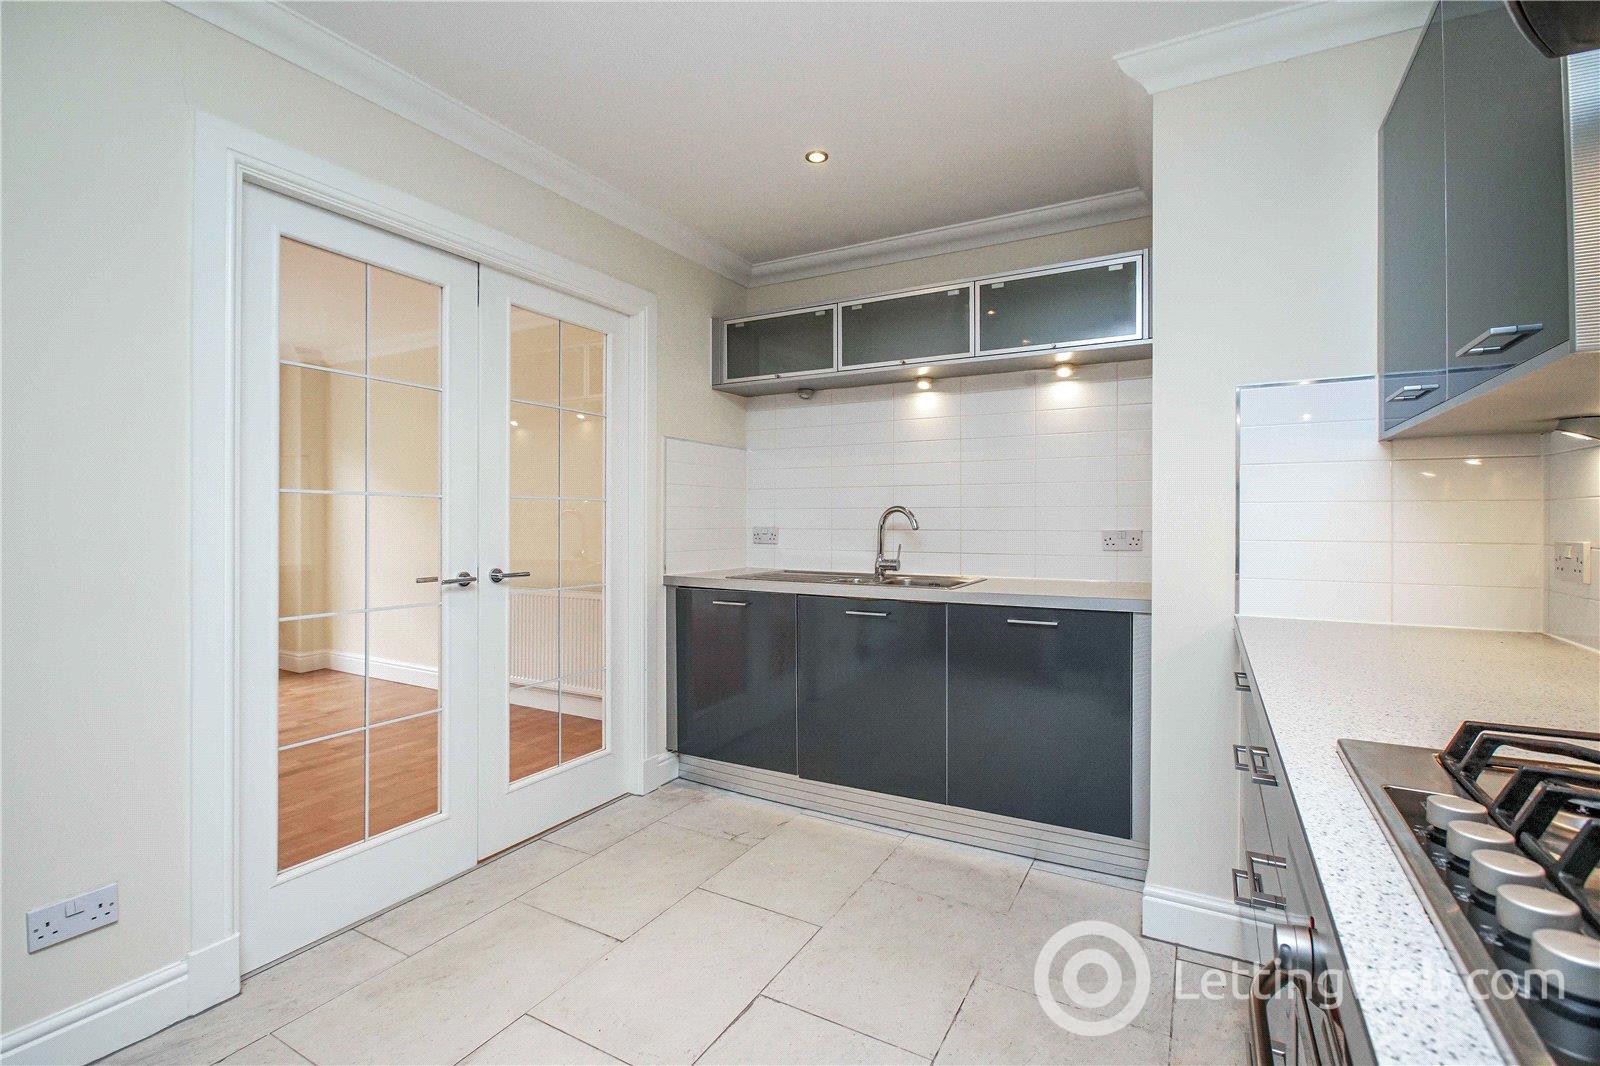 Property to rent in 1/1, 121 Hayburn Lane, Glasgow, Lanarkshire, G12